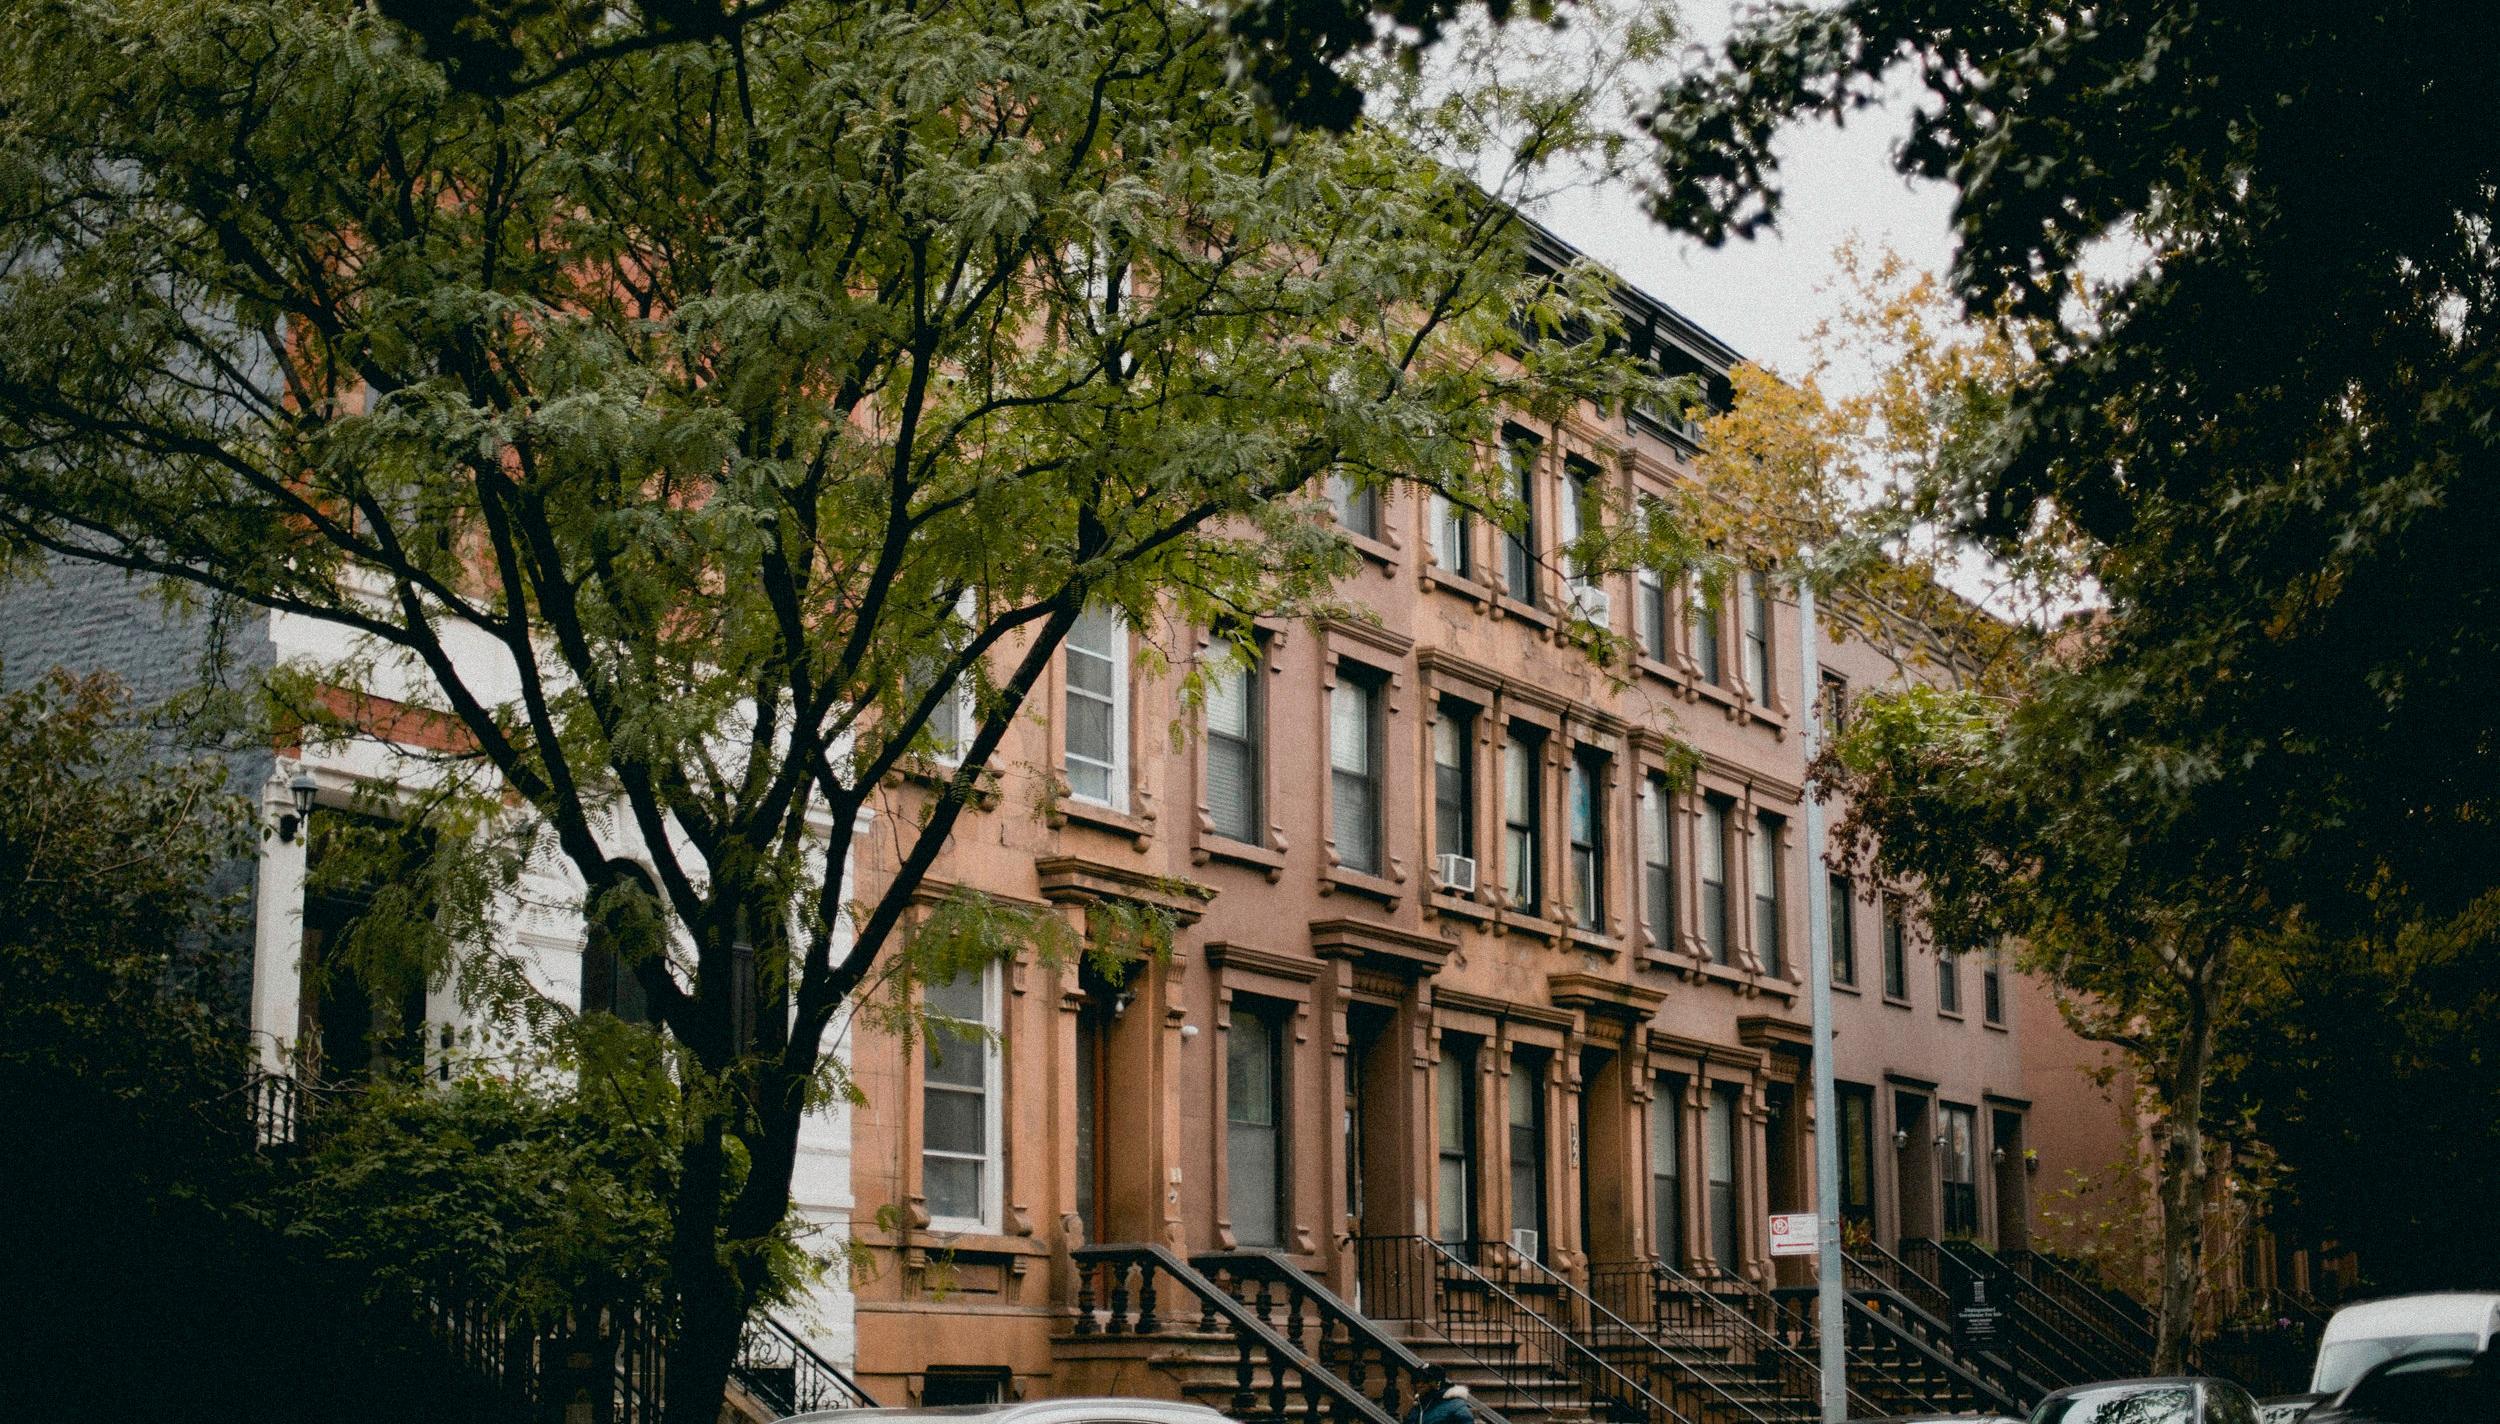 Boerum Hill Townhouse - Brooklyn, NY